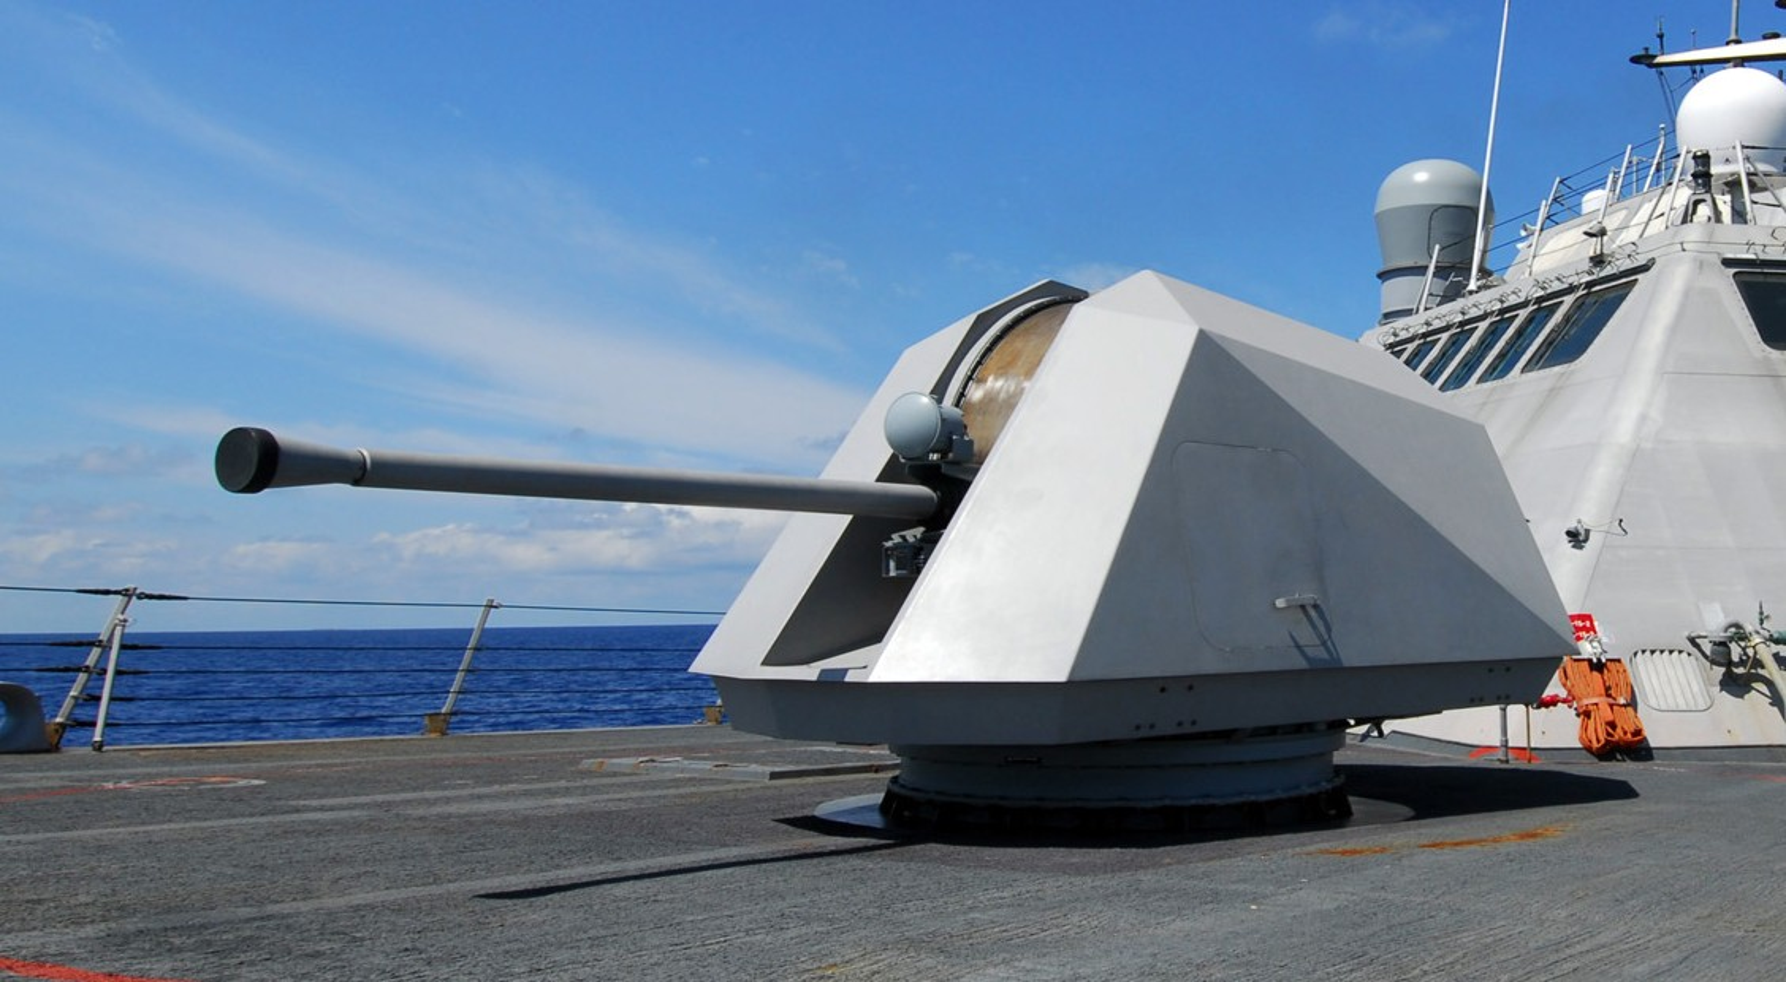 Mk-110 57mm 2.2 inches 70 caliber naval gun system LCS